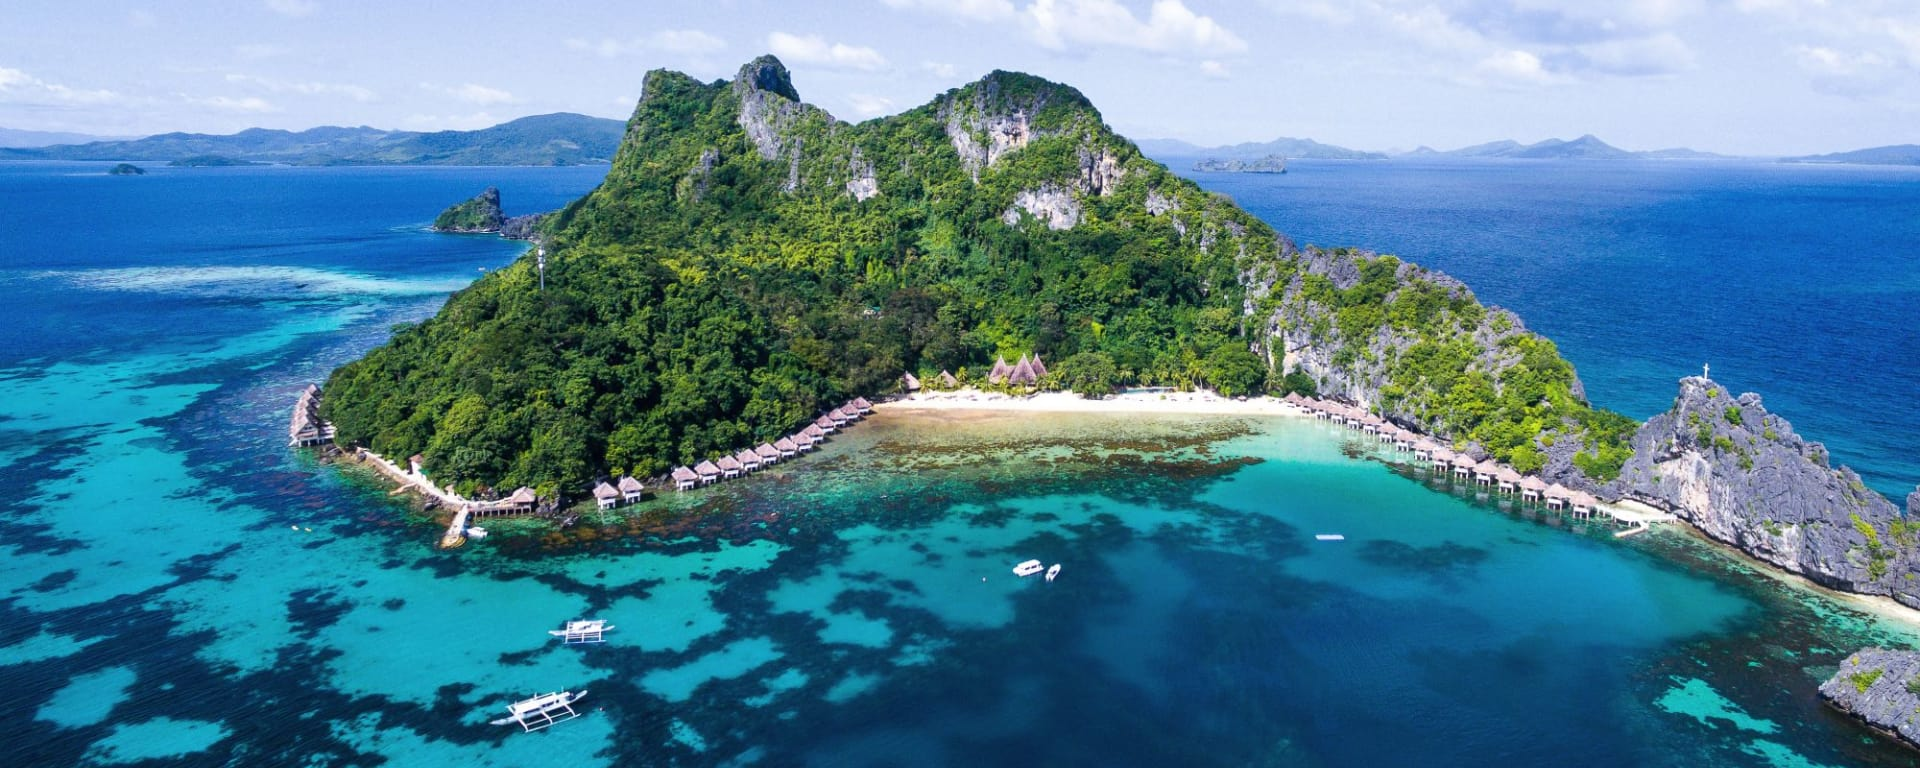 El Nido Resorts Apulit Island à Palawan: Birds eye view